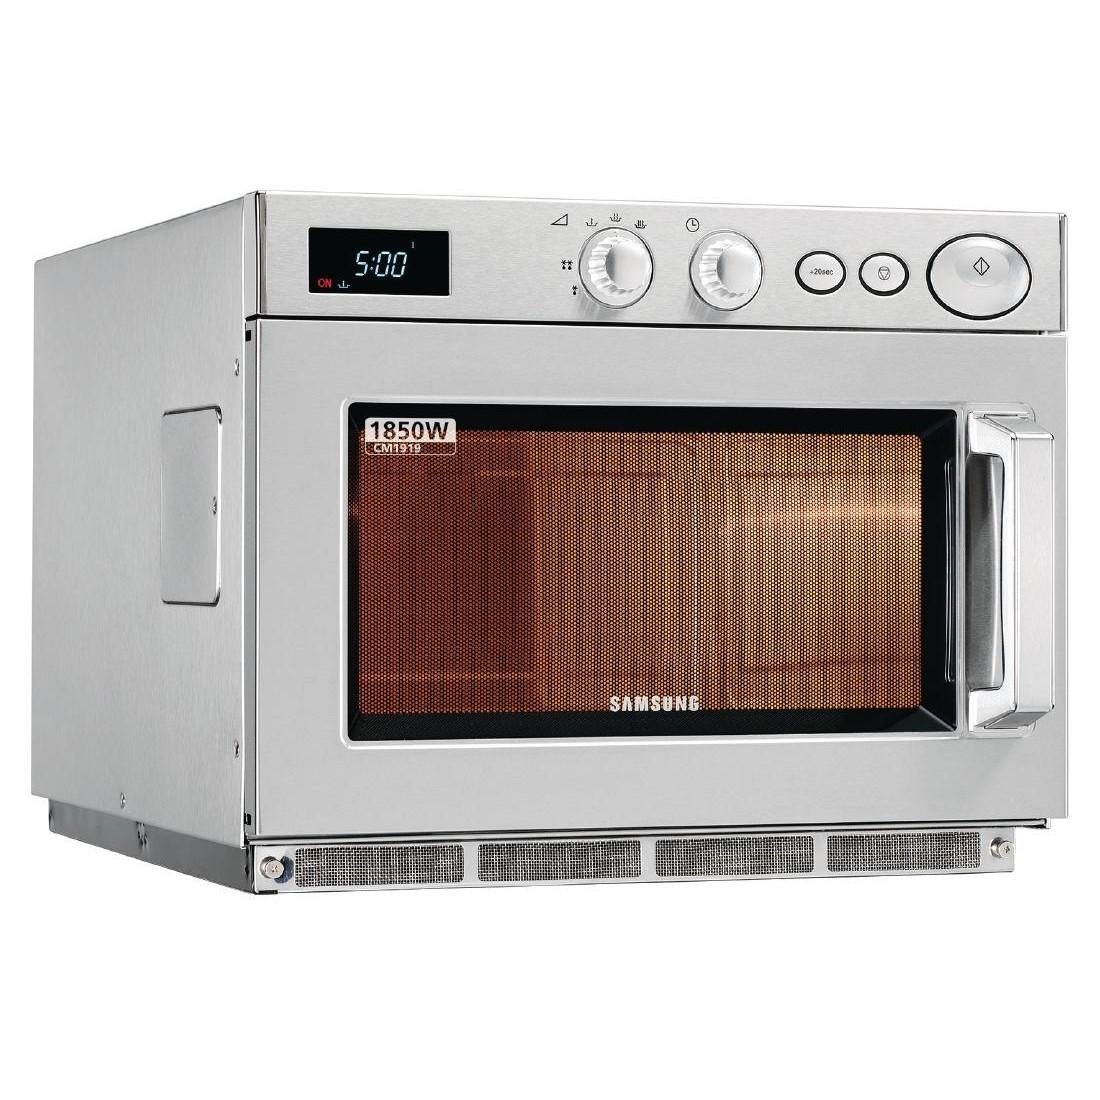 Buy Samsung 1850w Cm1919 Microwave Oven